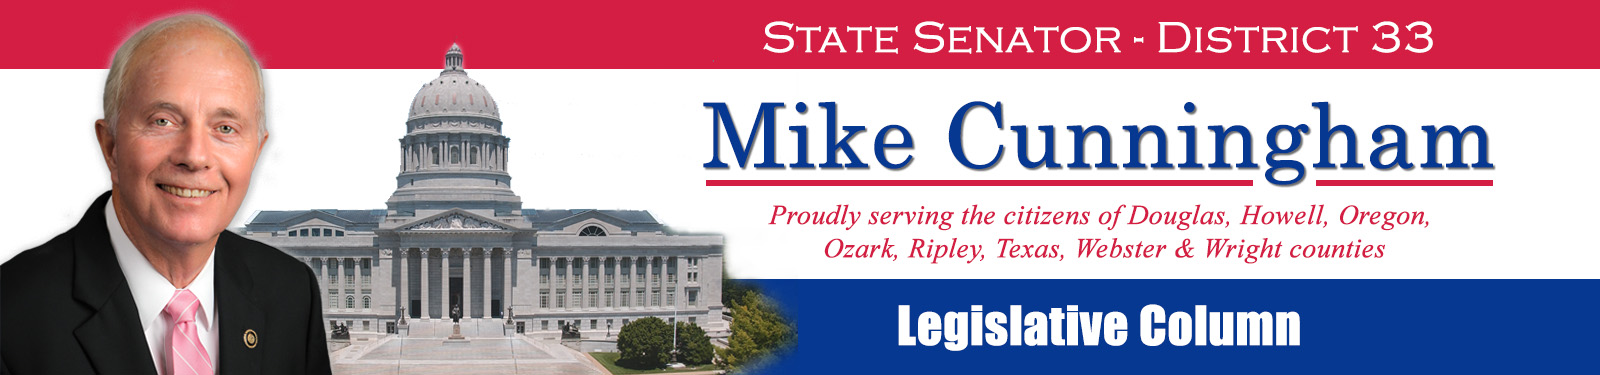 Sen. Mike Cunningham's Legislative Column for Dec. 28, 2020 – Missouri Senate